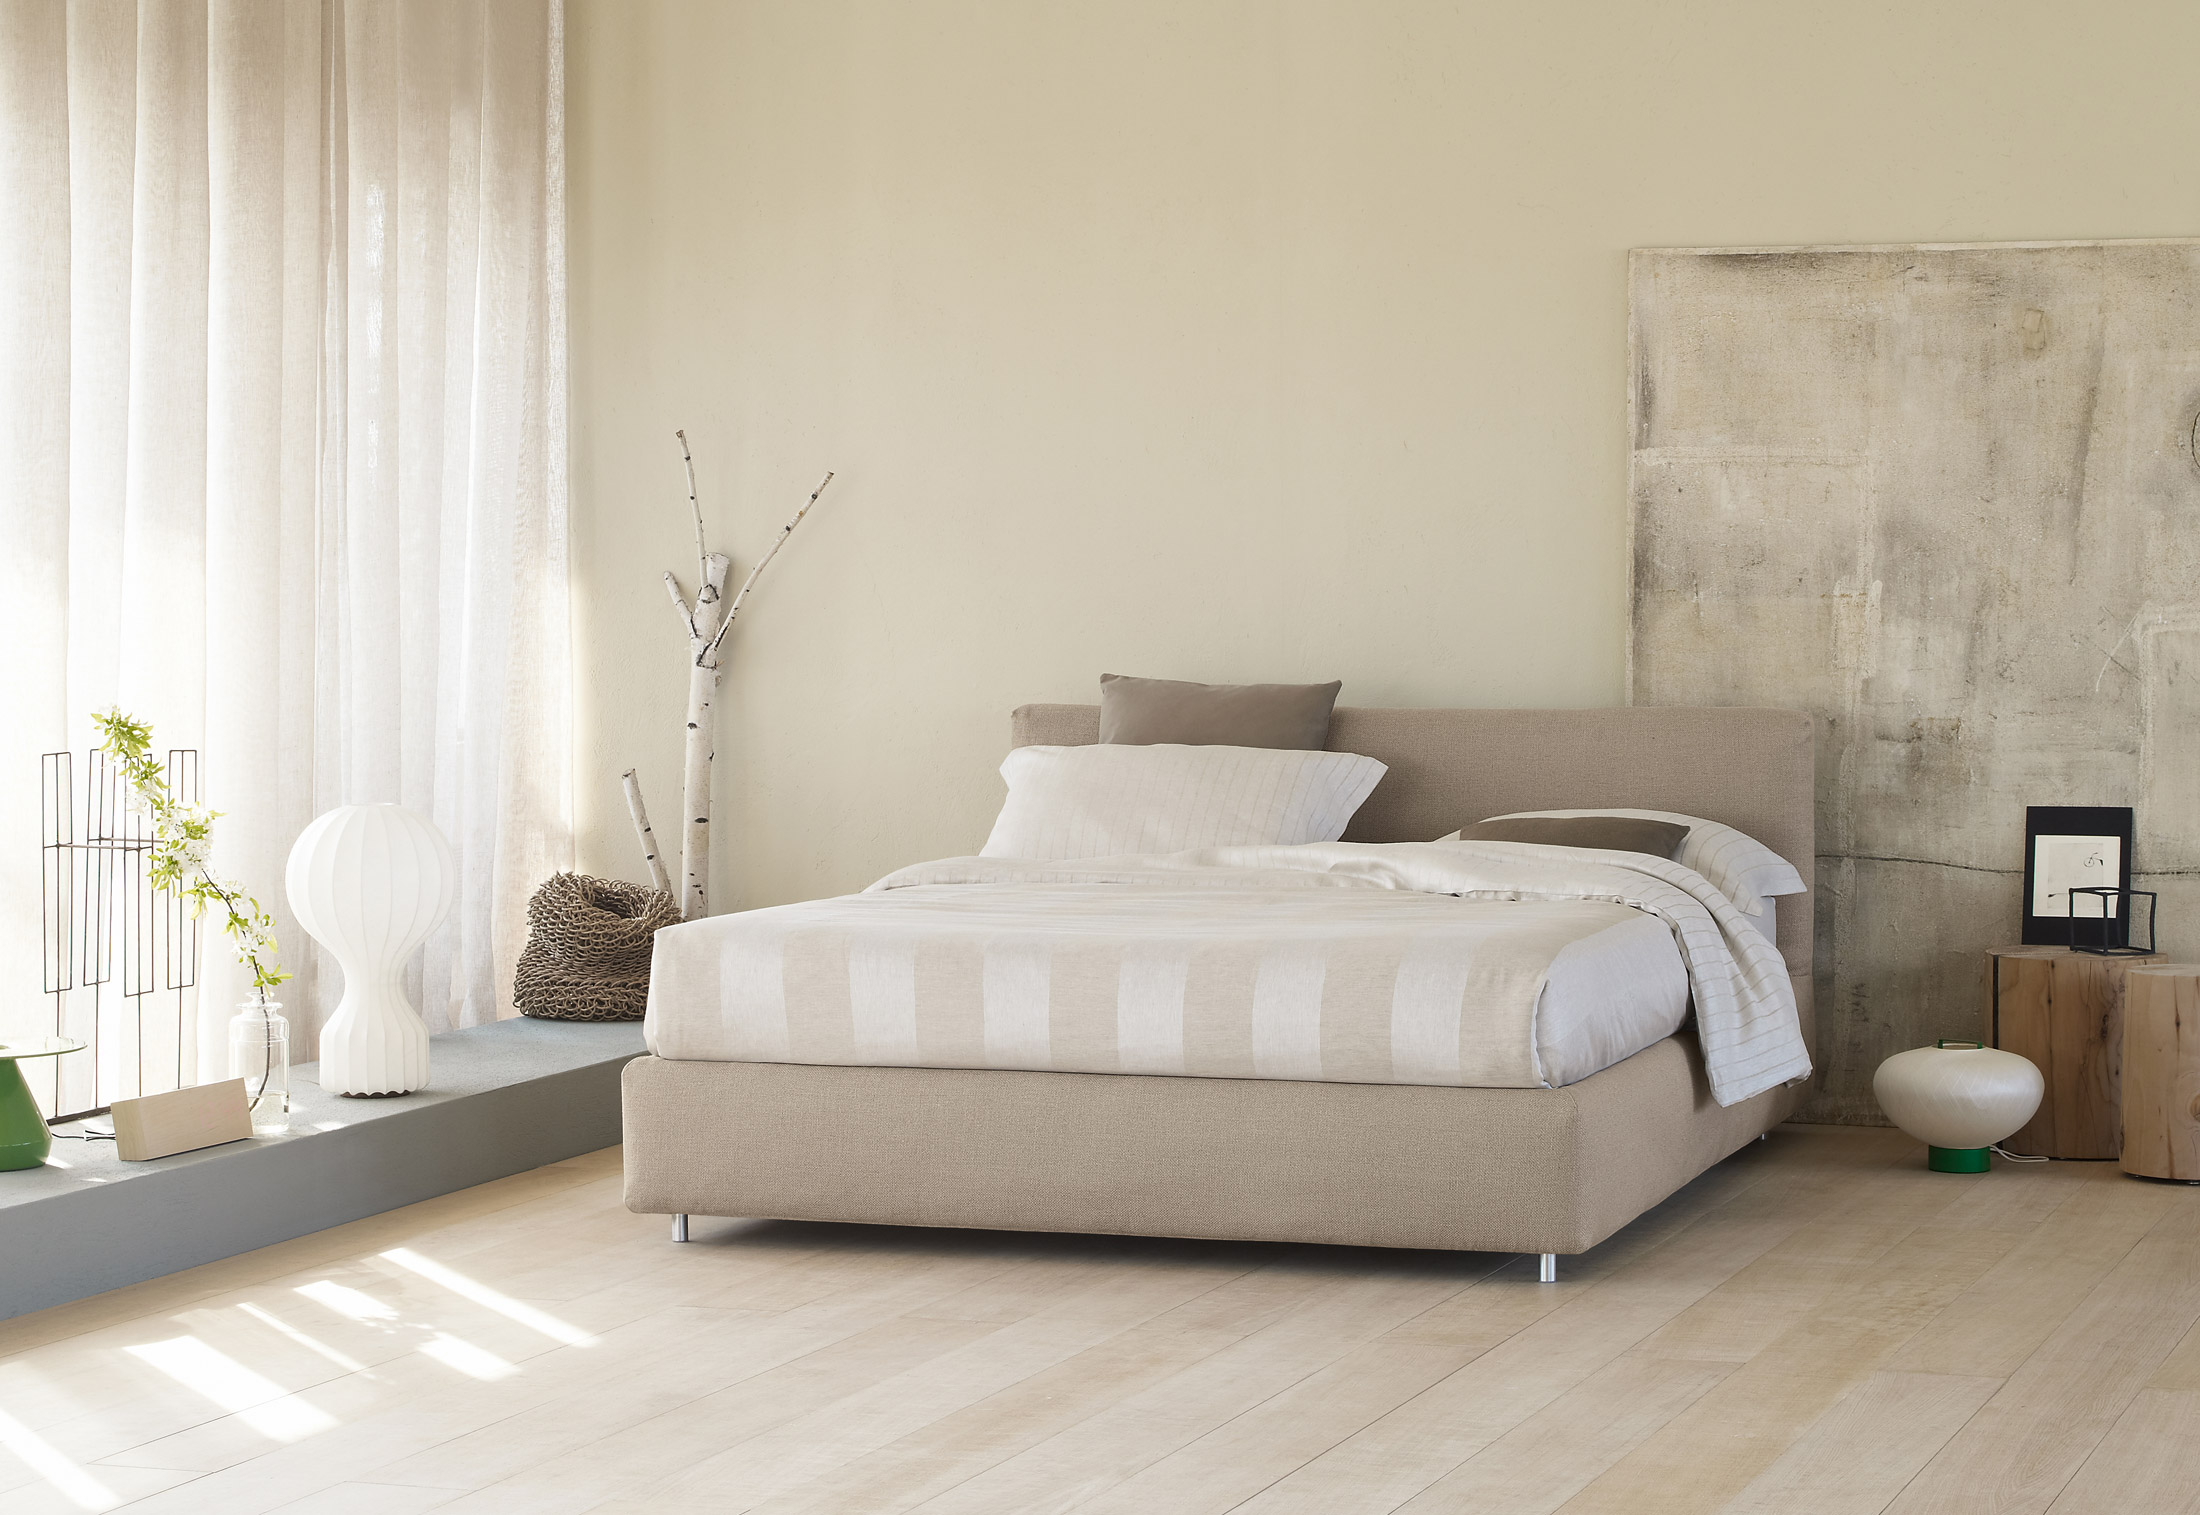 merkurio doppelbett von flou stylepark. Black Bedroom Furniture Sets. Home Design Ideas